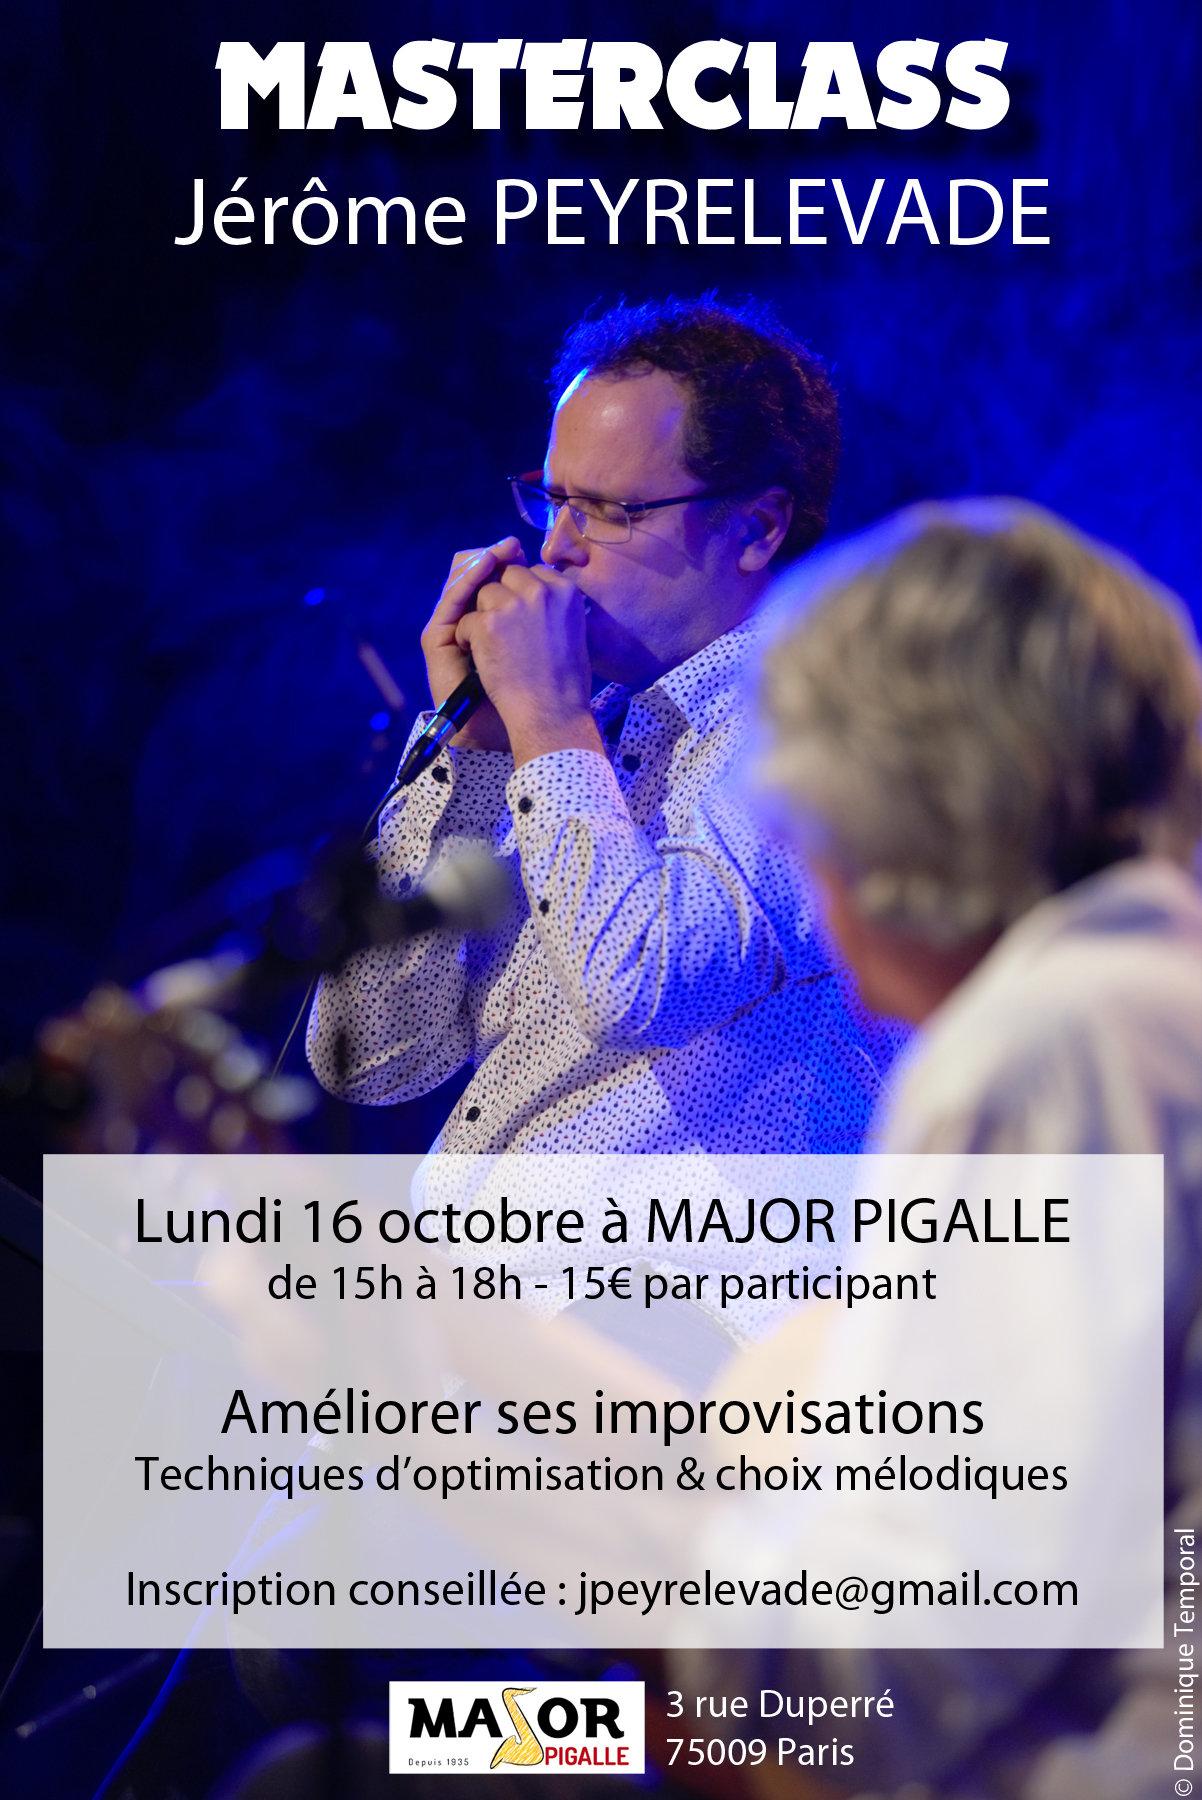 Masterclass à Major Pigalle le 16 octobre Cf52dae4-d12a-4a82-9ccf-e29979b922eb